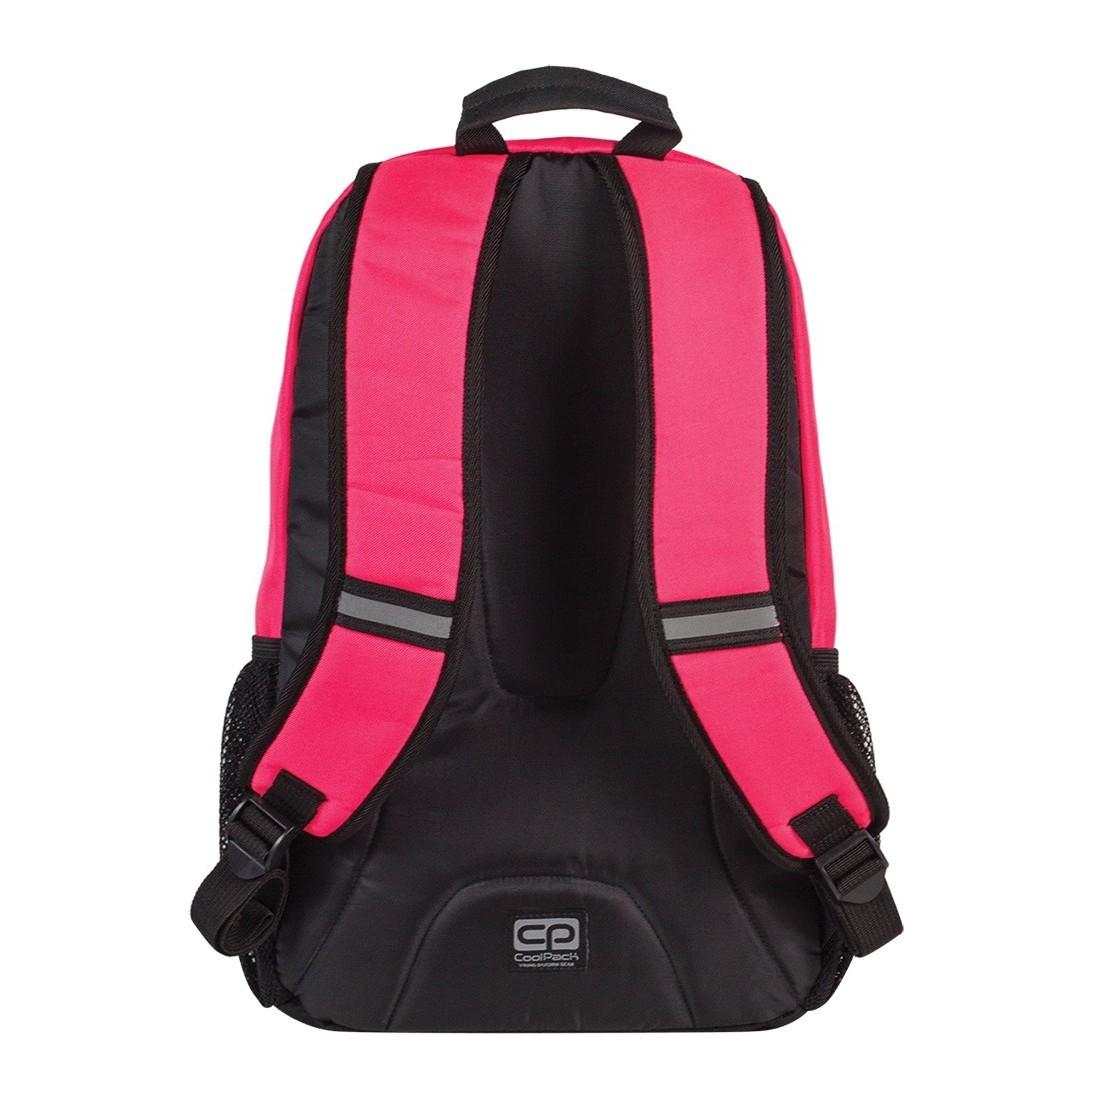 Plecak młodzieżowy CoolPack ACTION 2 przegrody RUBIN NEON CP 428 - plecak-tornister.pl